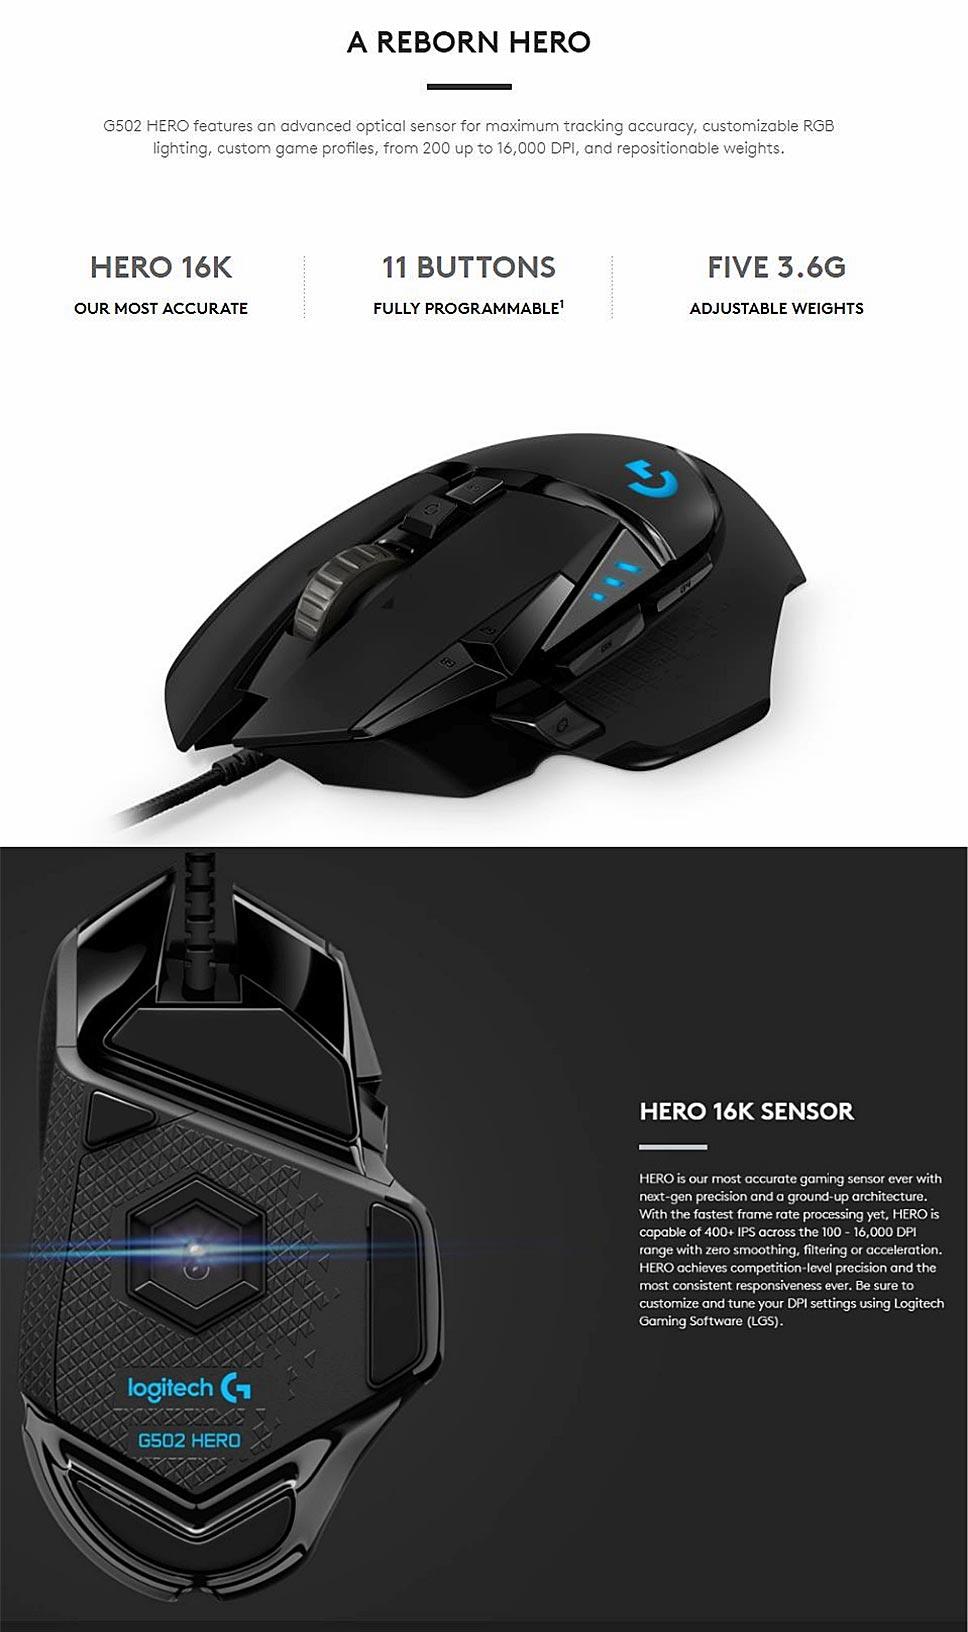 Logitech (G) G502 Hero Master Wired Game Mouse Full Line Upgrade